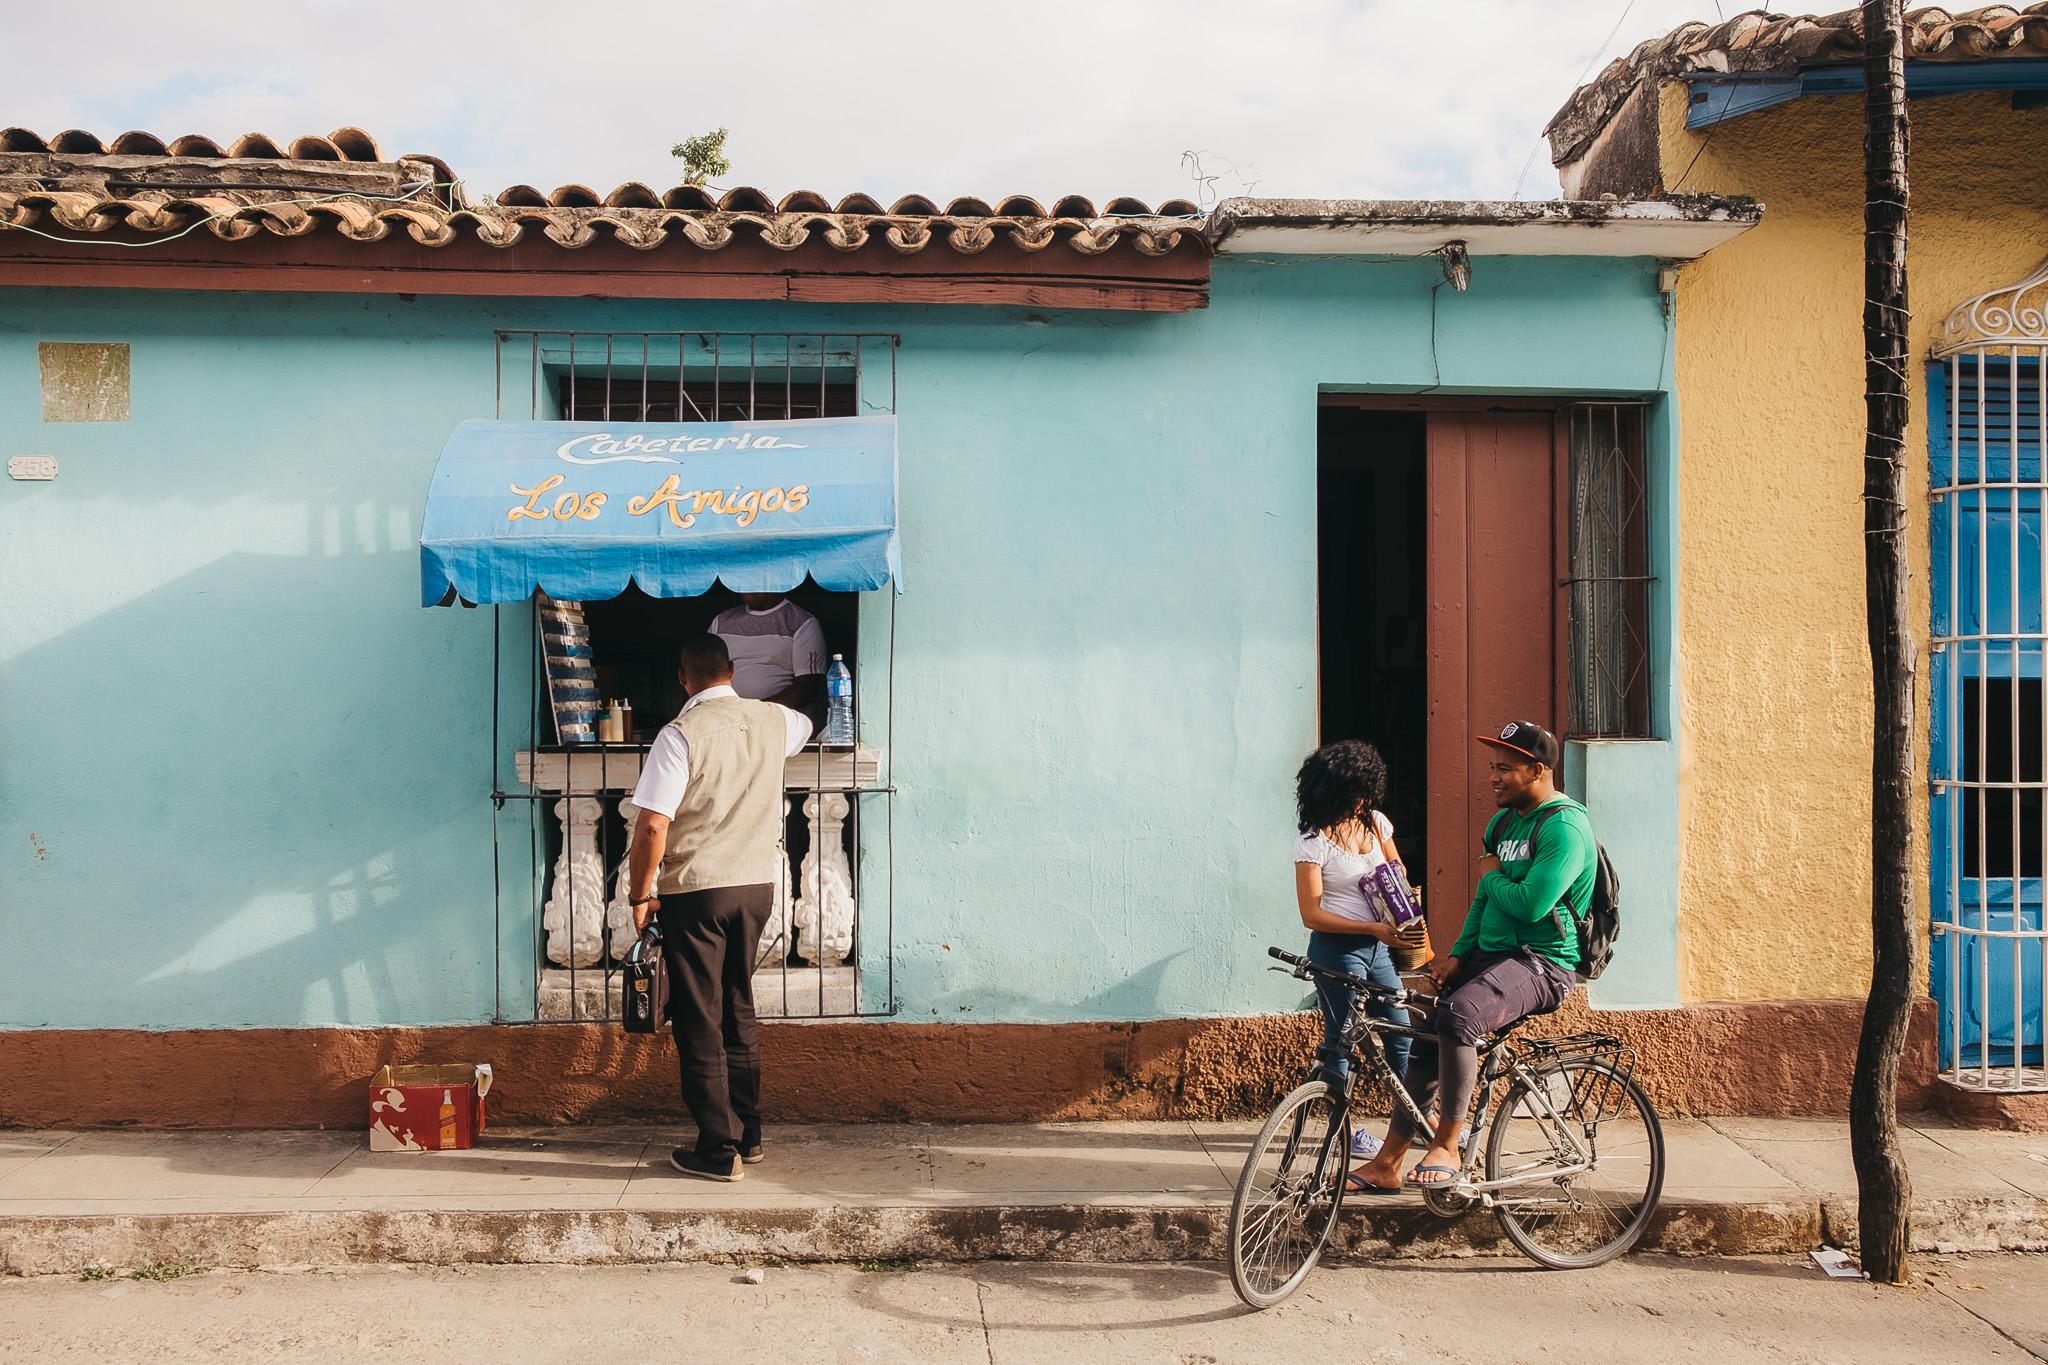 Cuba-2017-12-Trinidad-0169.jpg